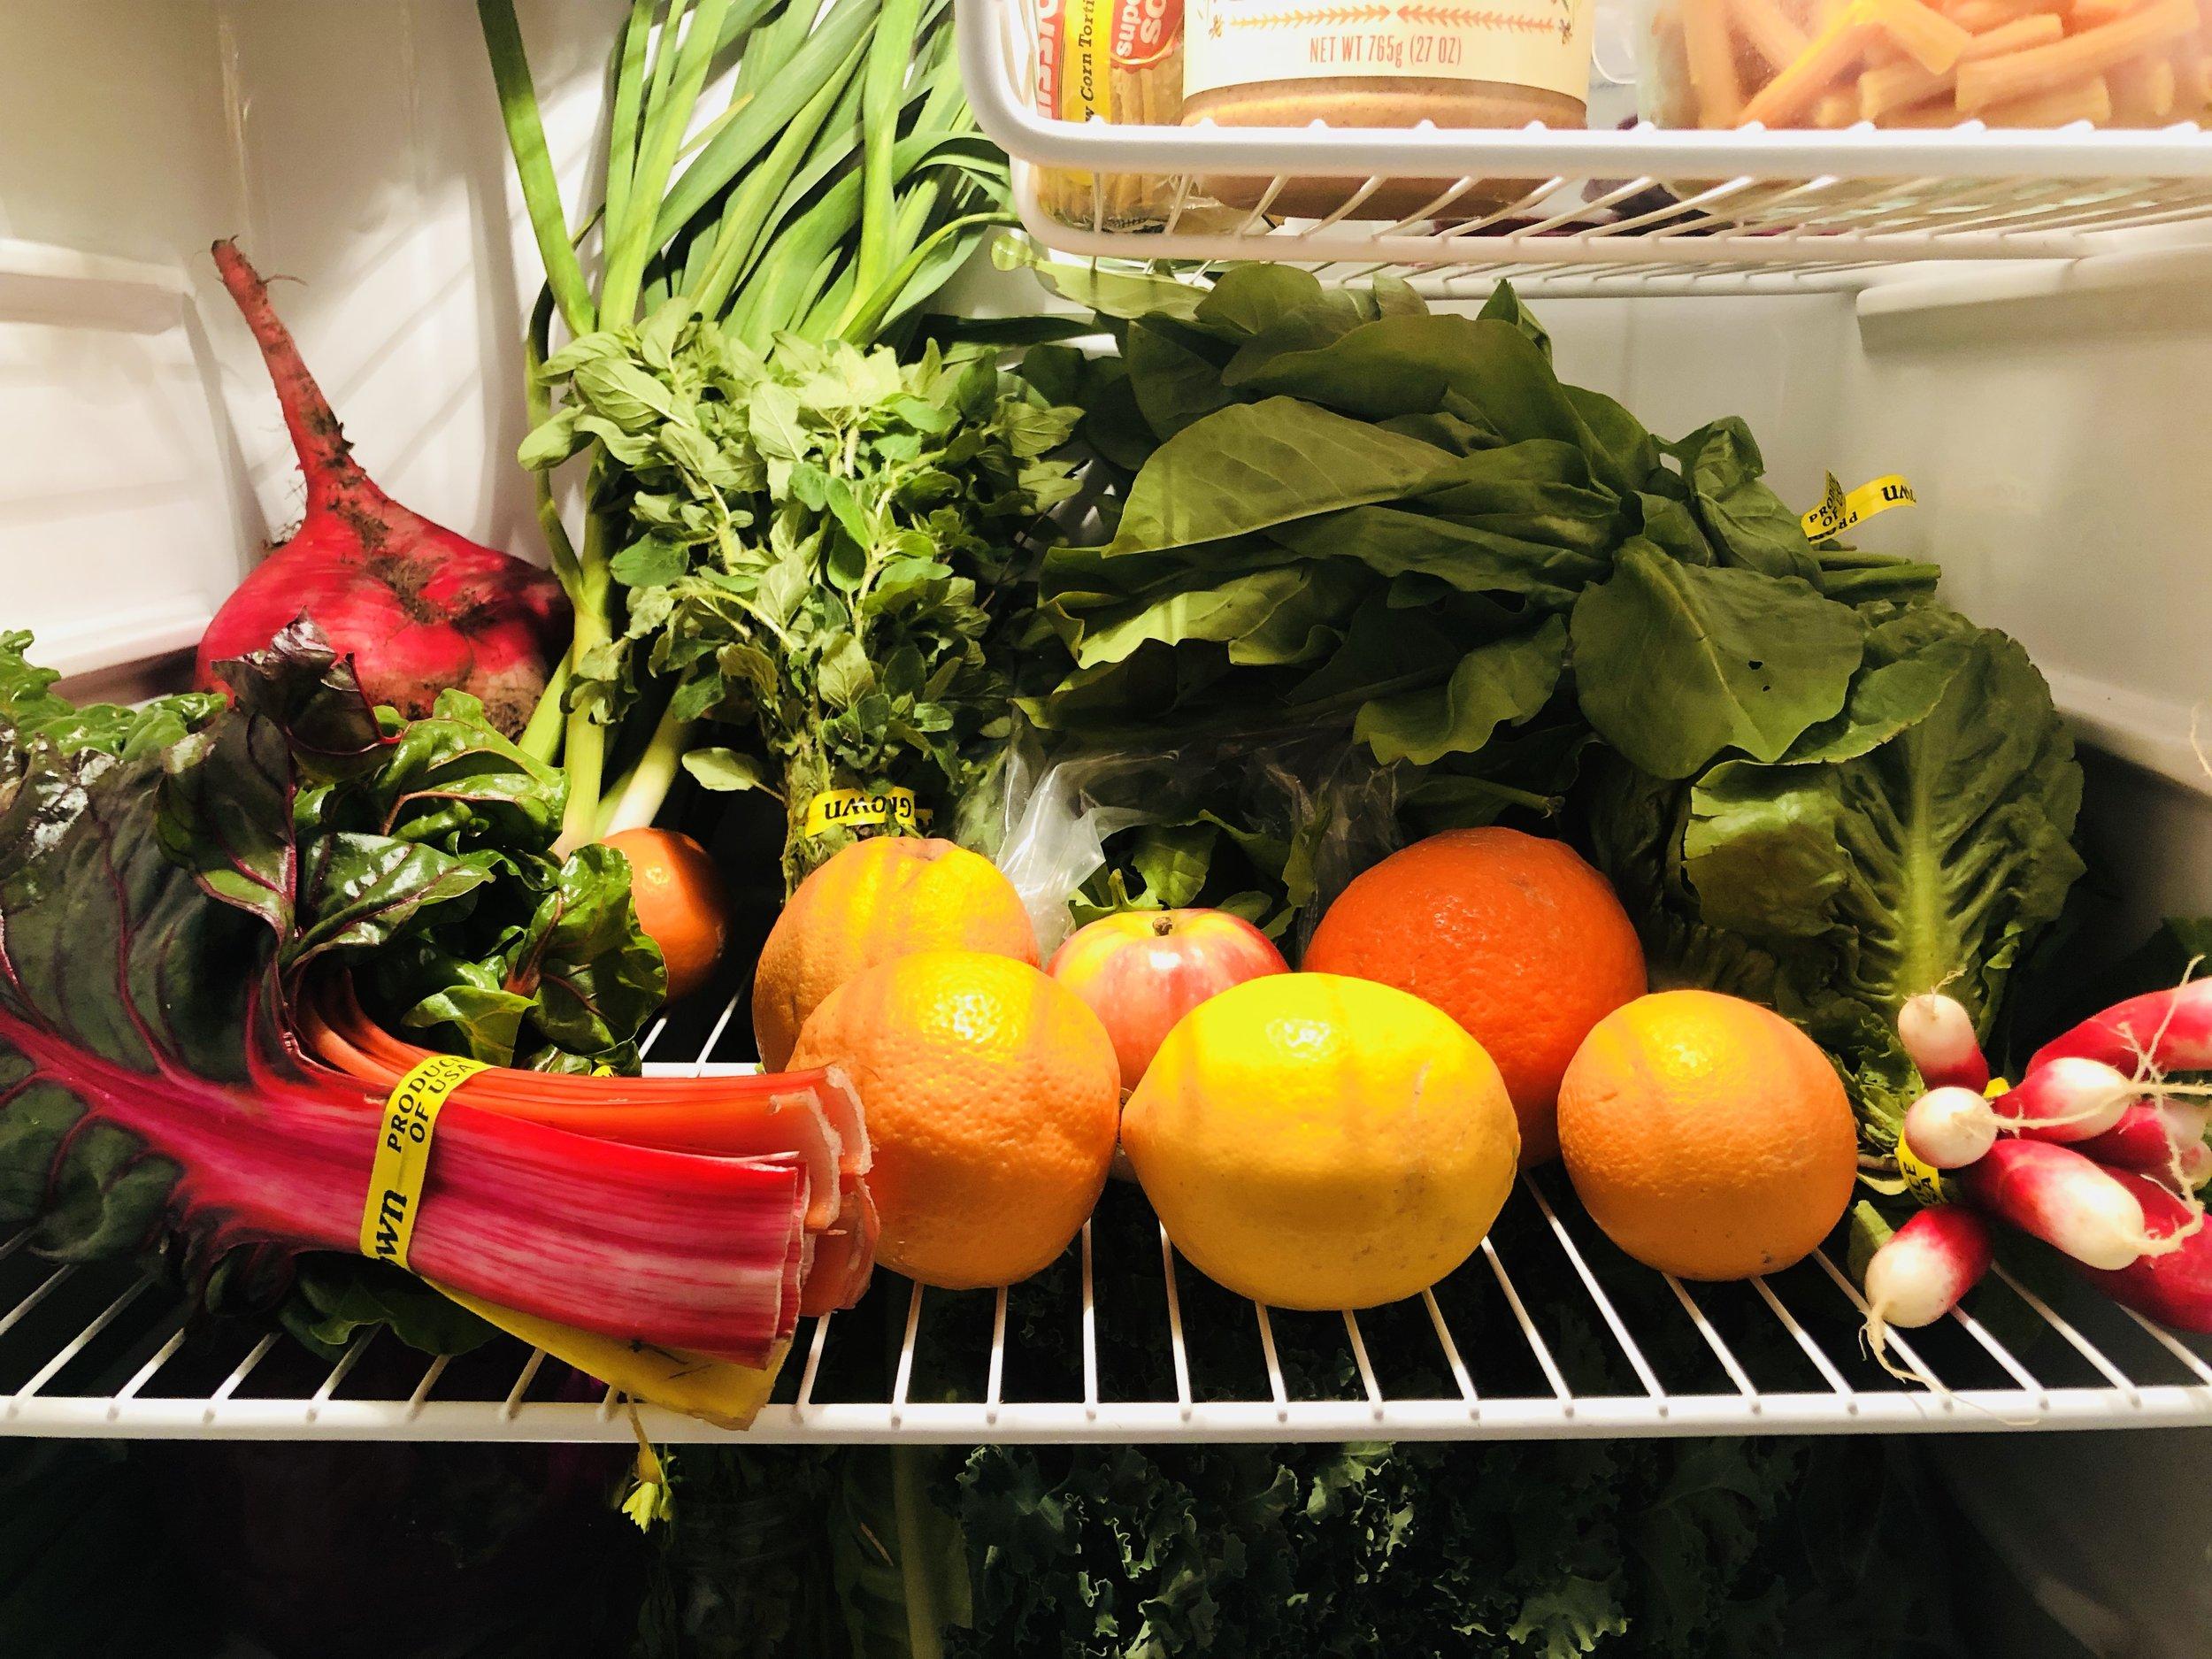 Tara Firm Farms review produce in my fridge.